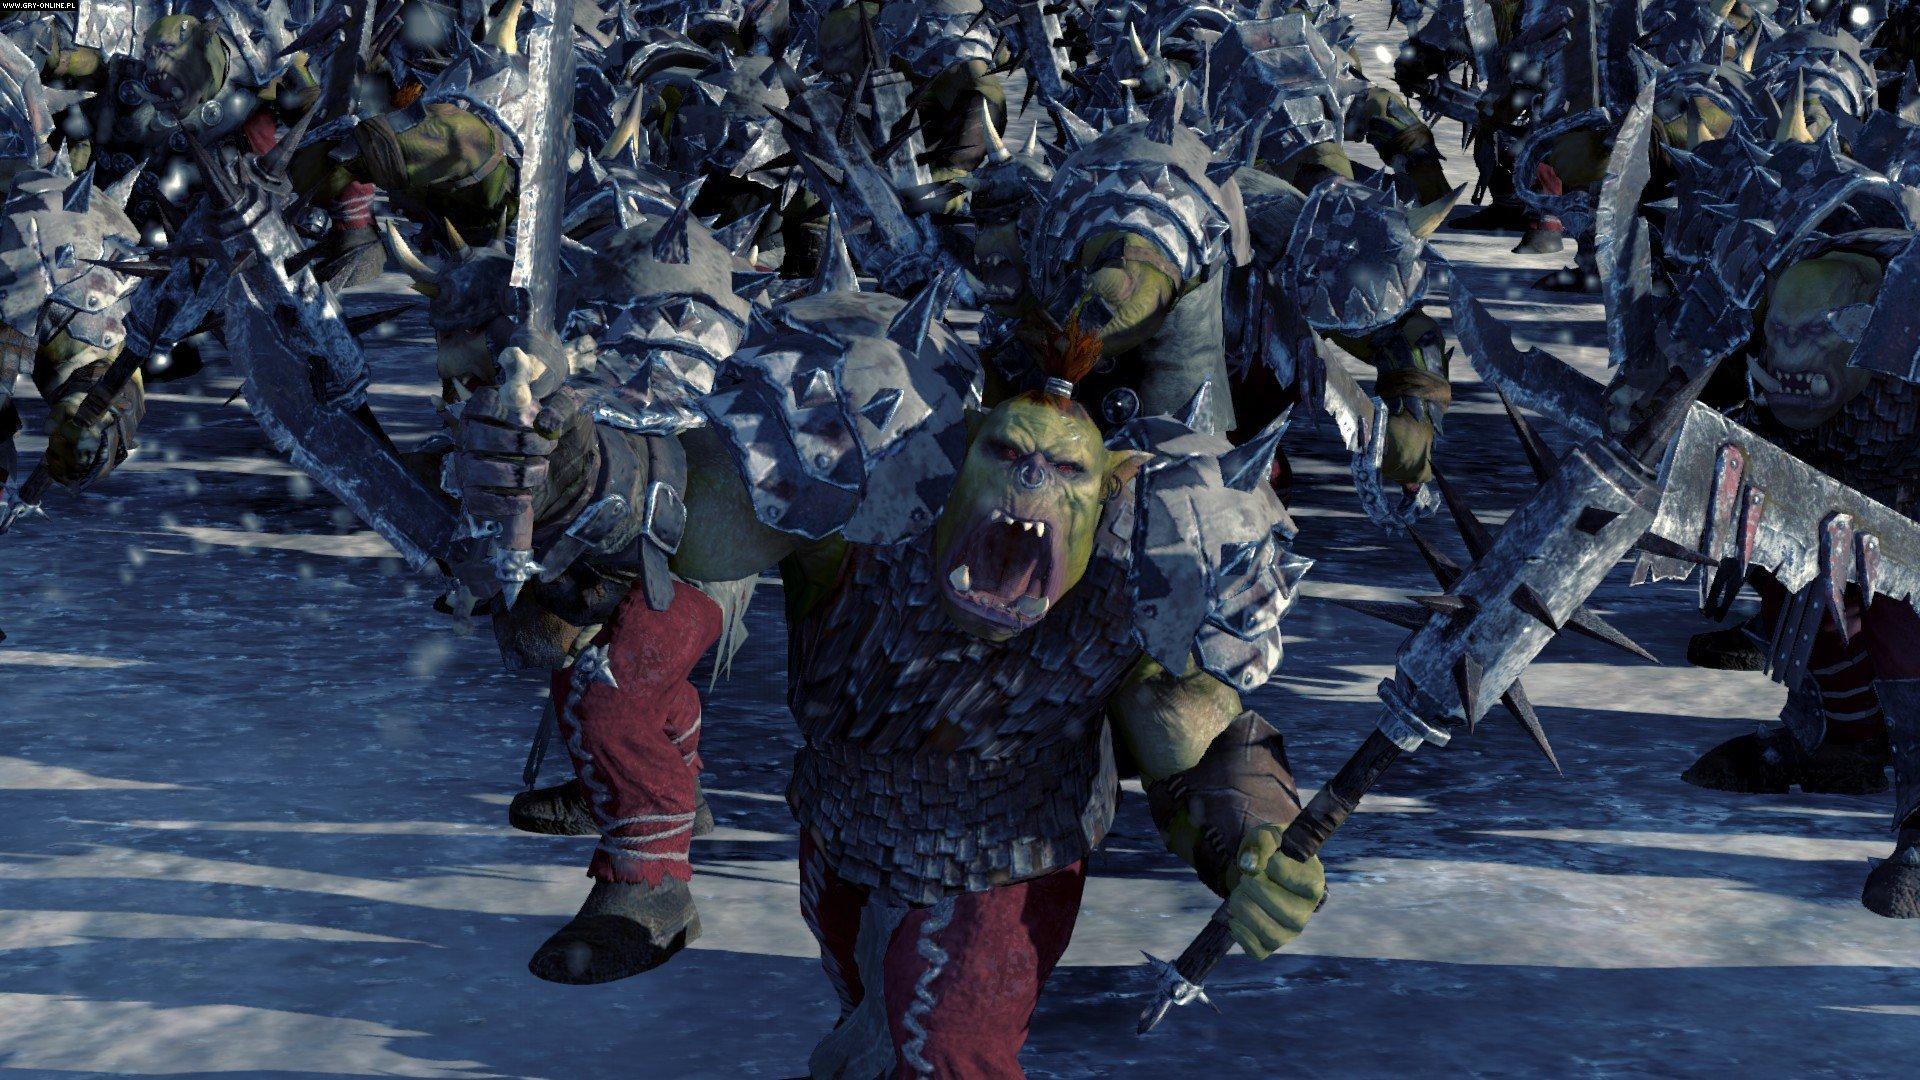 total war warhammer review рецензия обзор отвратительные мужики вархаммер disgusting men